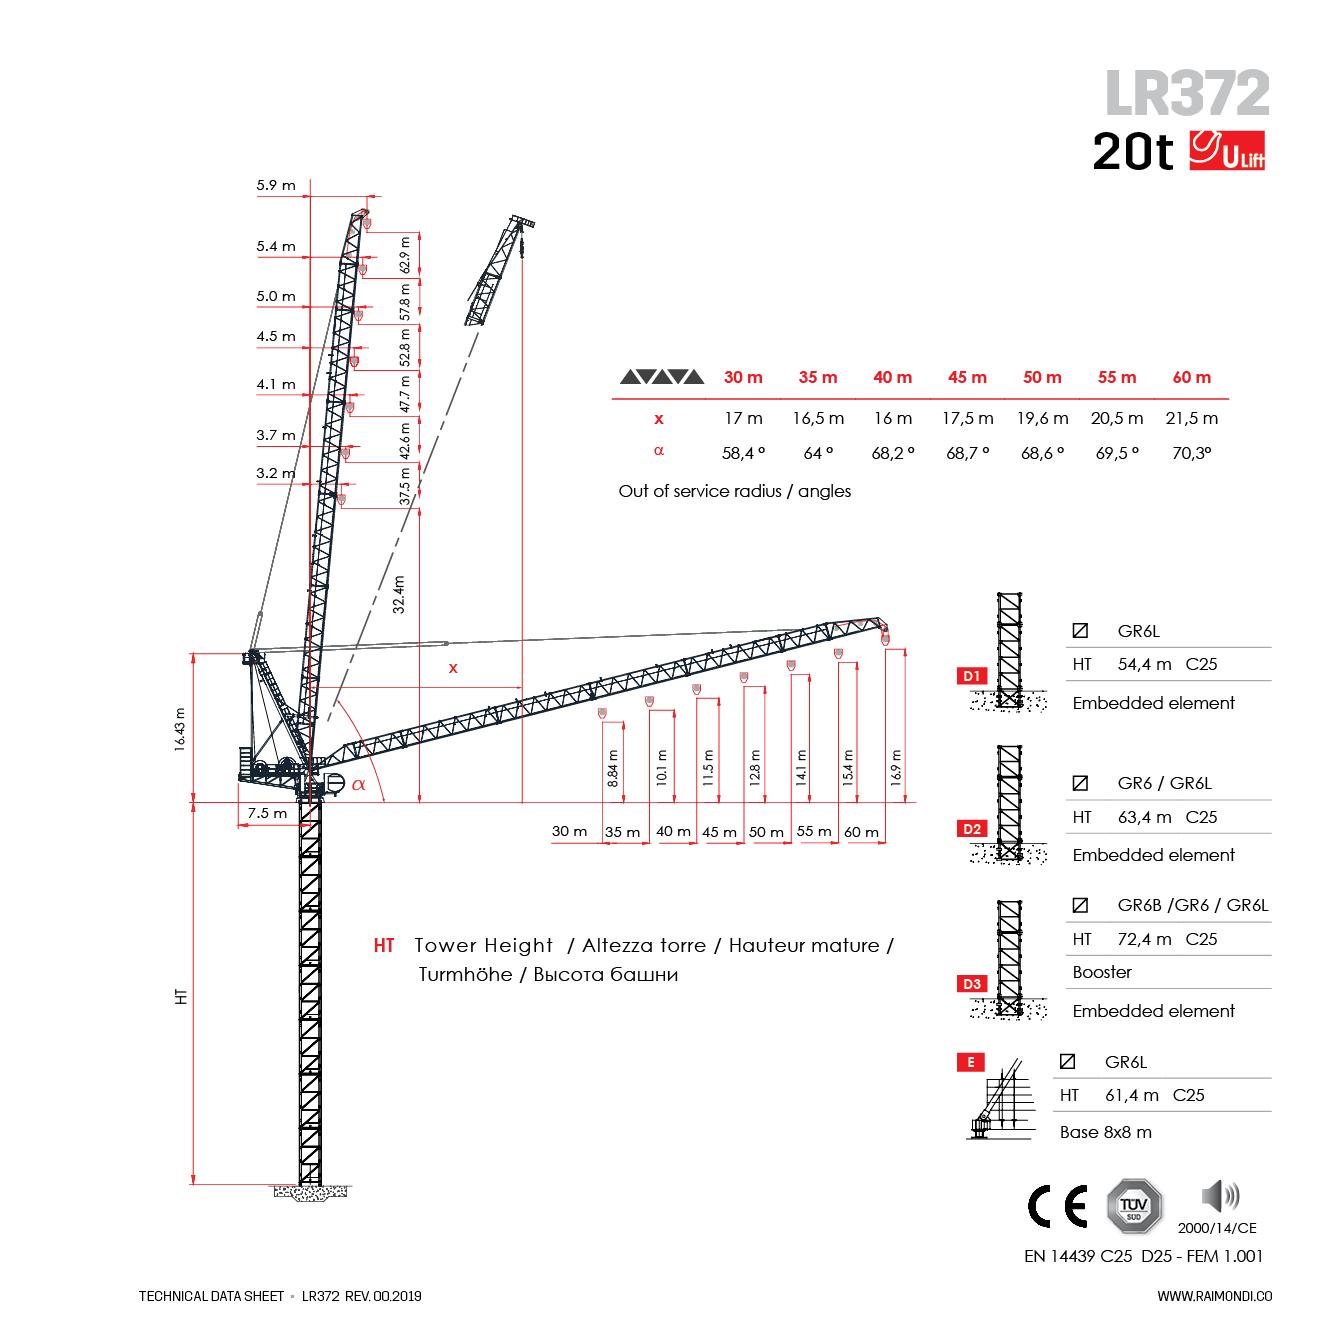 hight resolution of downloads raimondi lr372 luffing jib crane